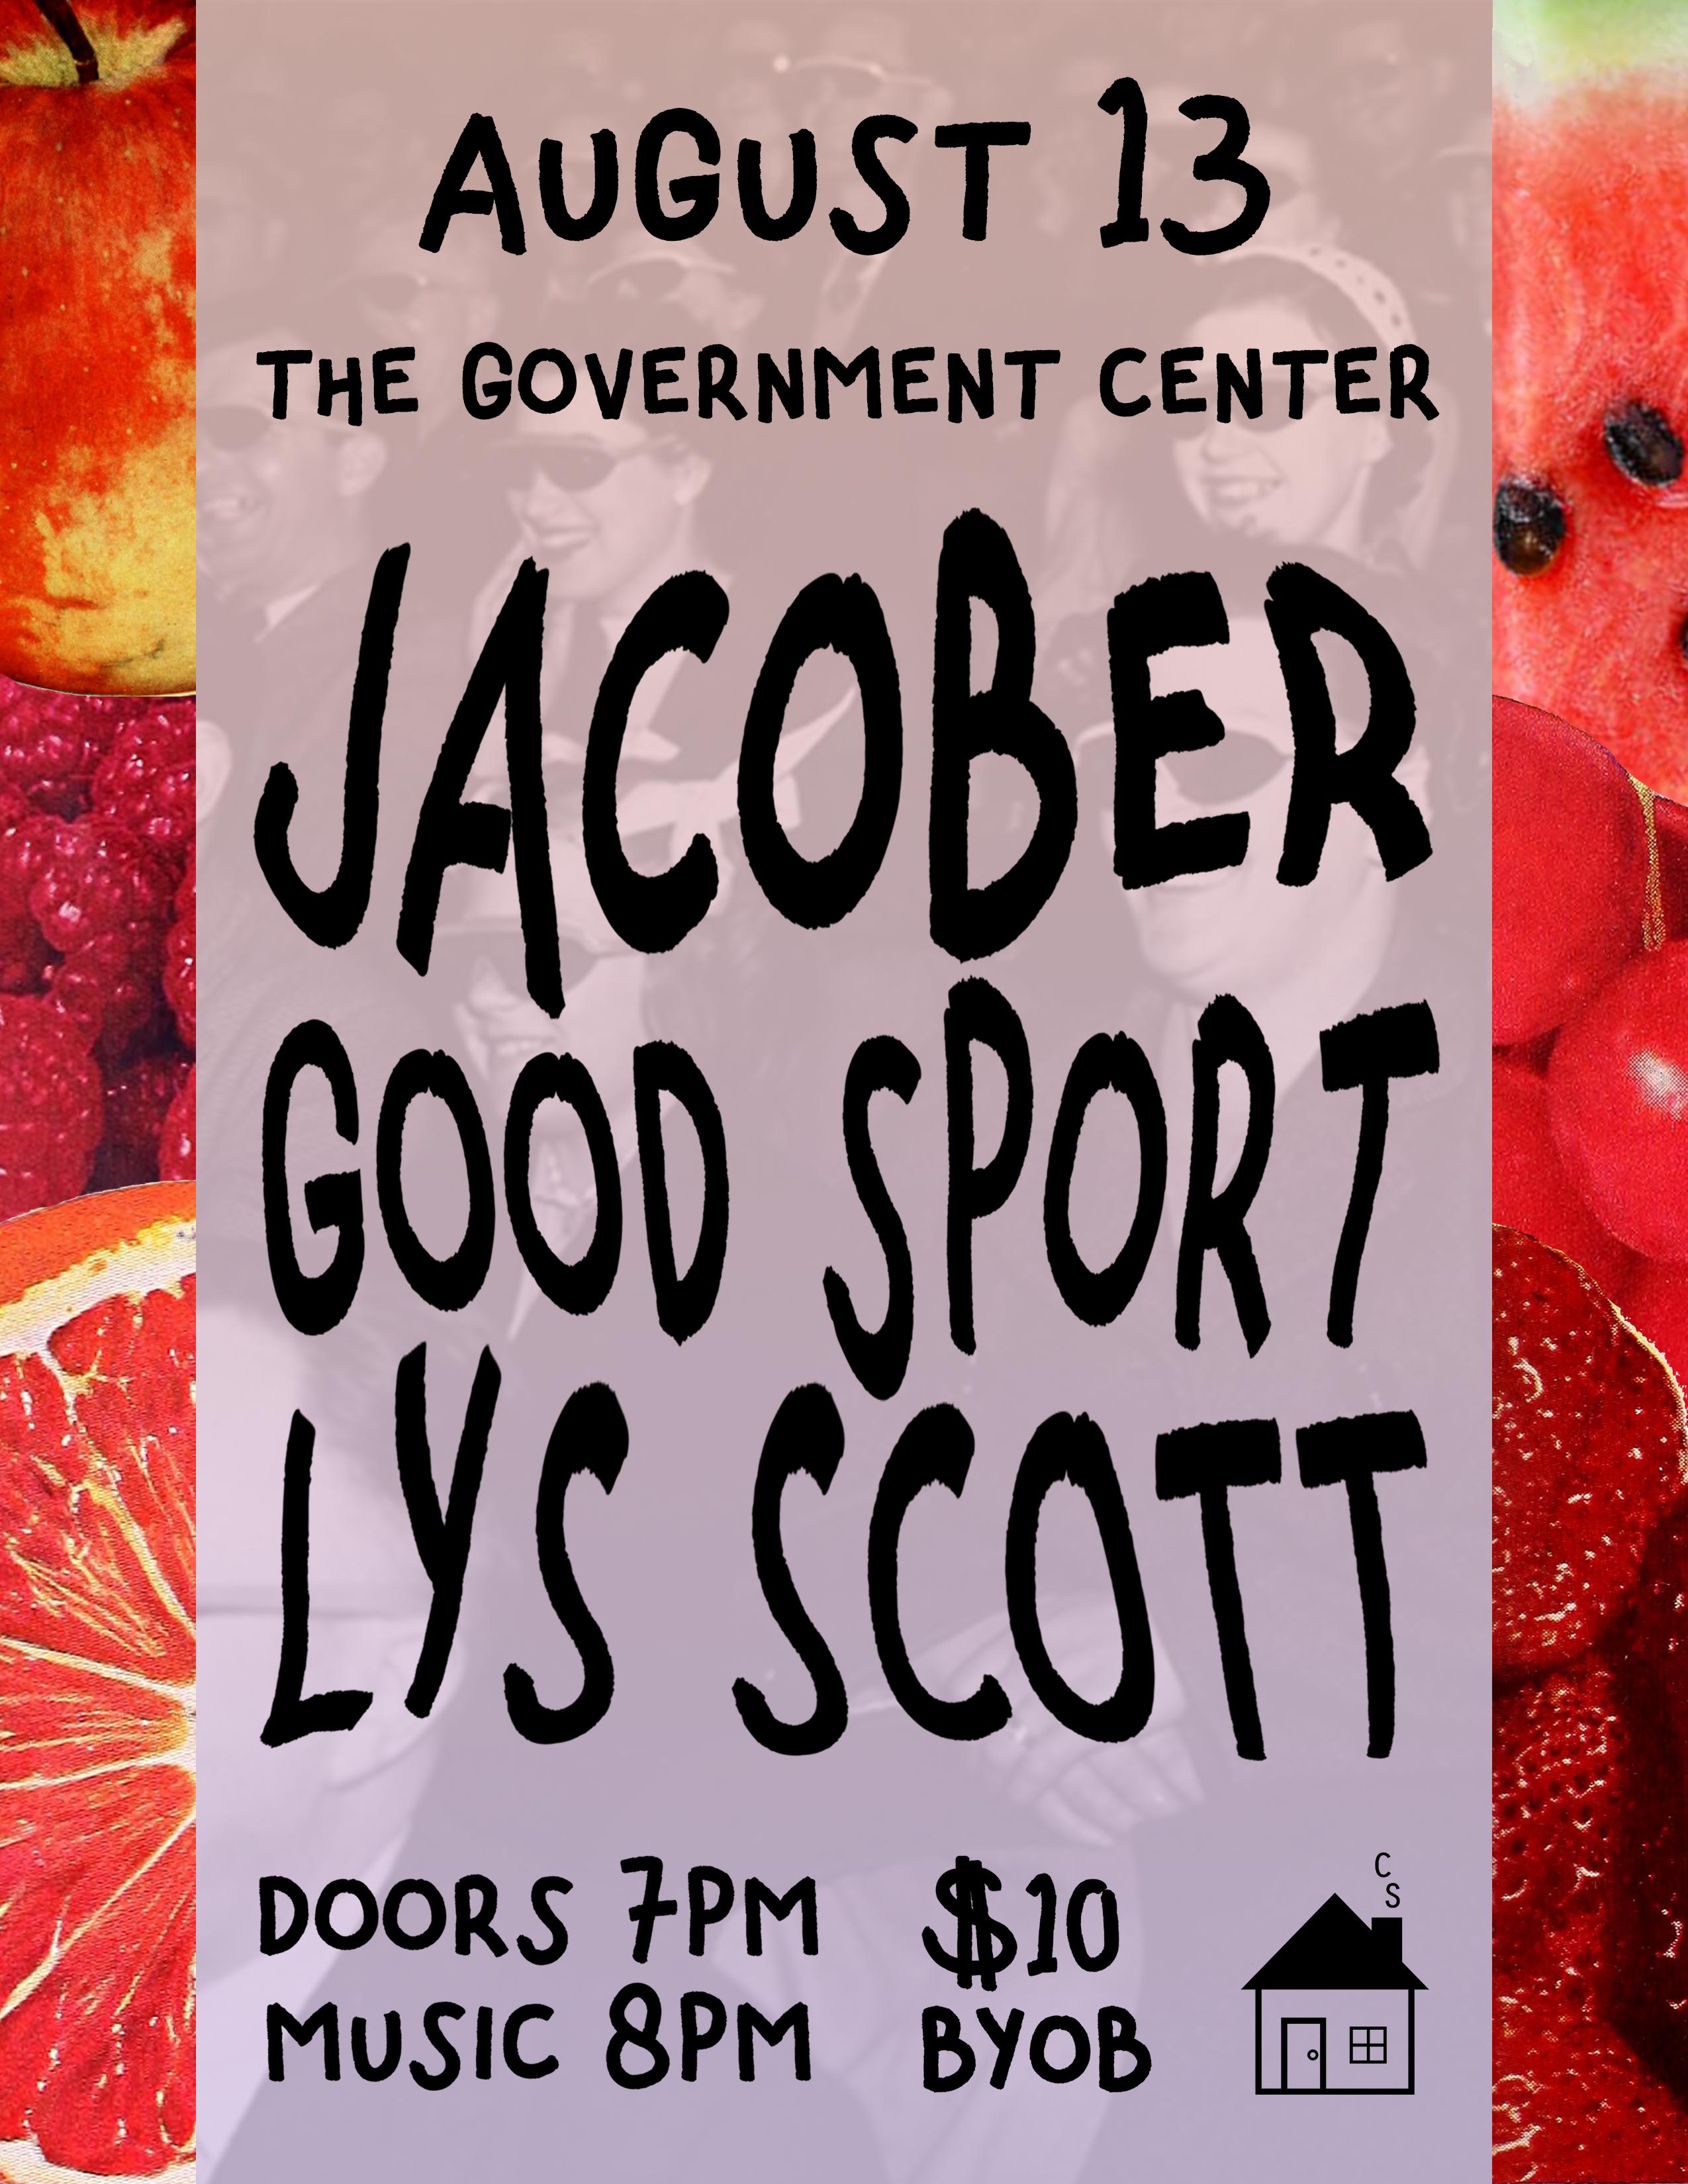 Jacober, Good Sport, Lys Scott @ The Government Center - August 13, 2021